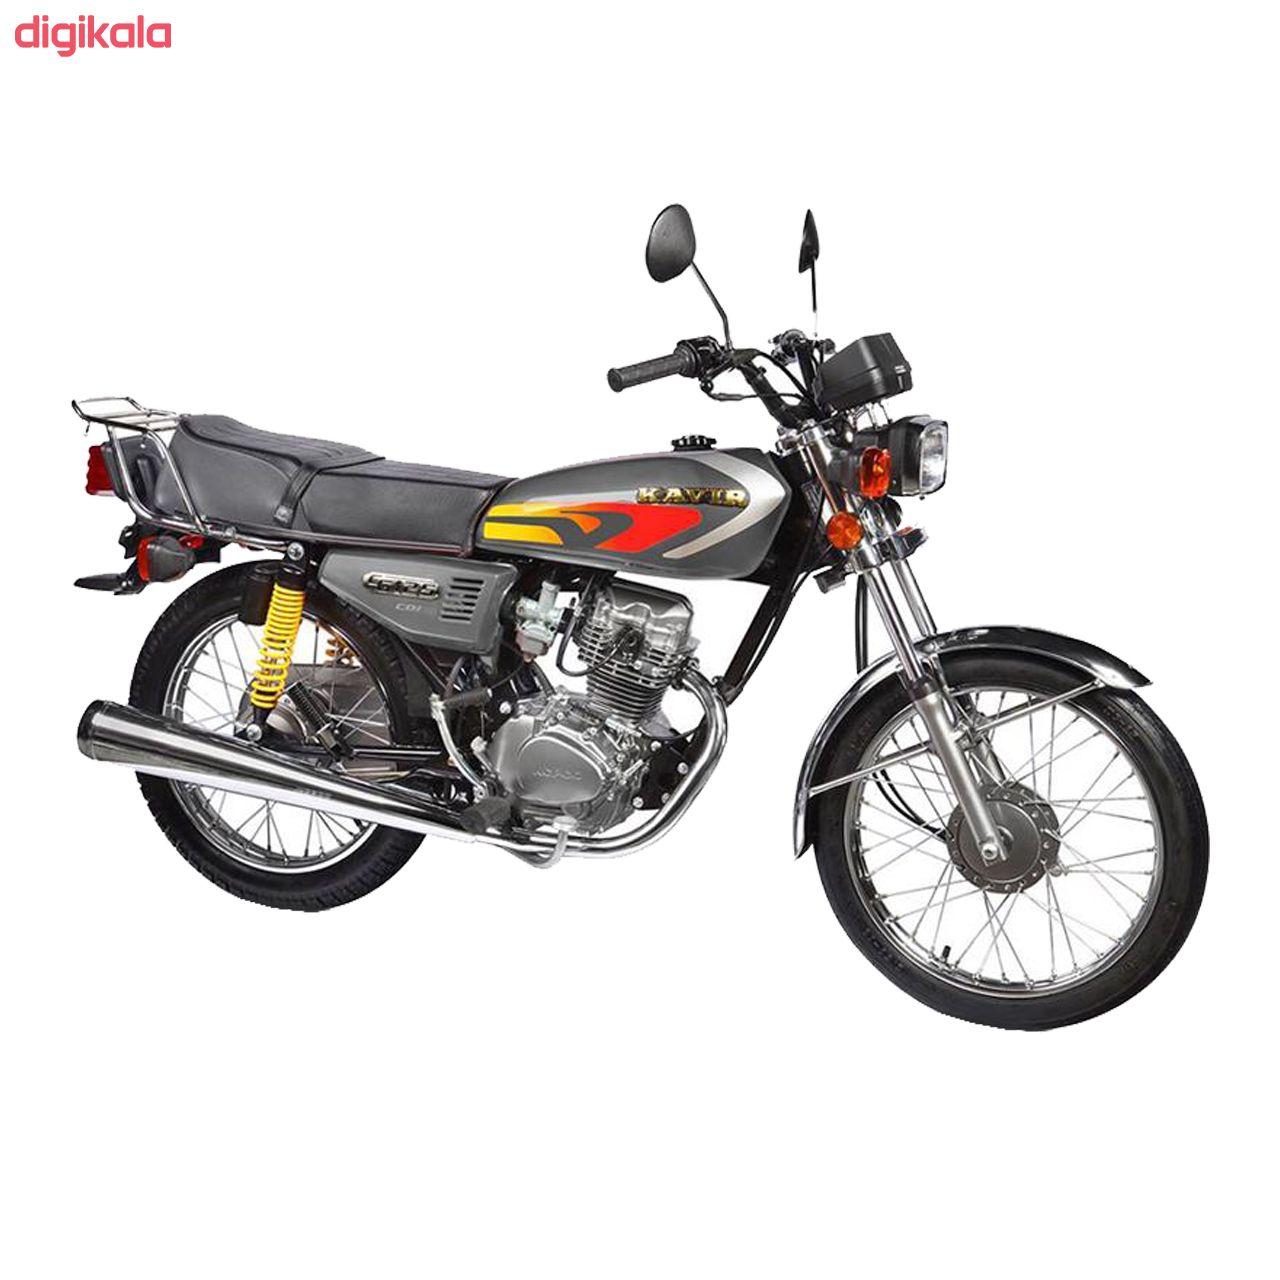 موتورسیکلت کویر مدل سی دی آی 125 سی سی سال 1399 main 1 1